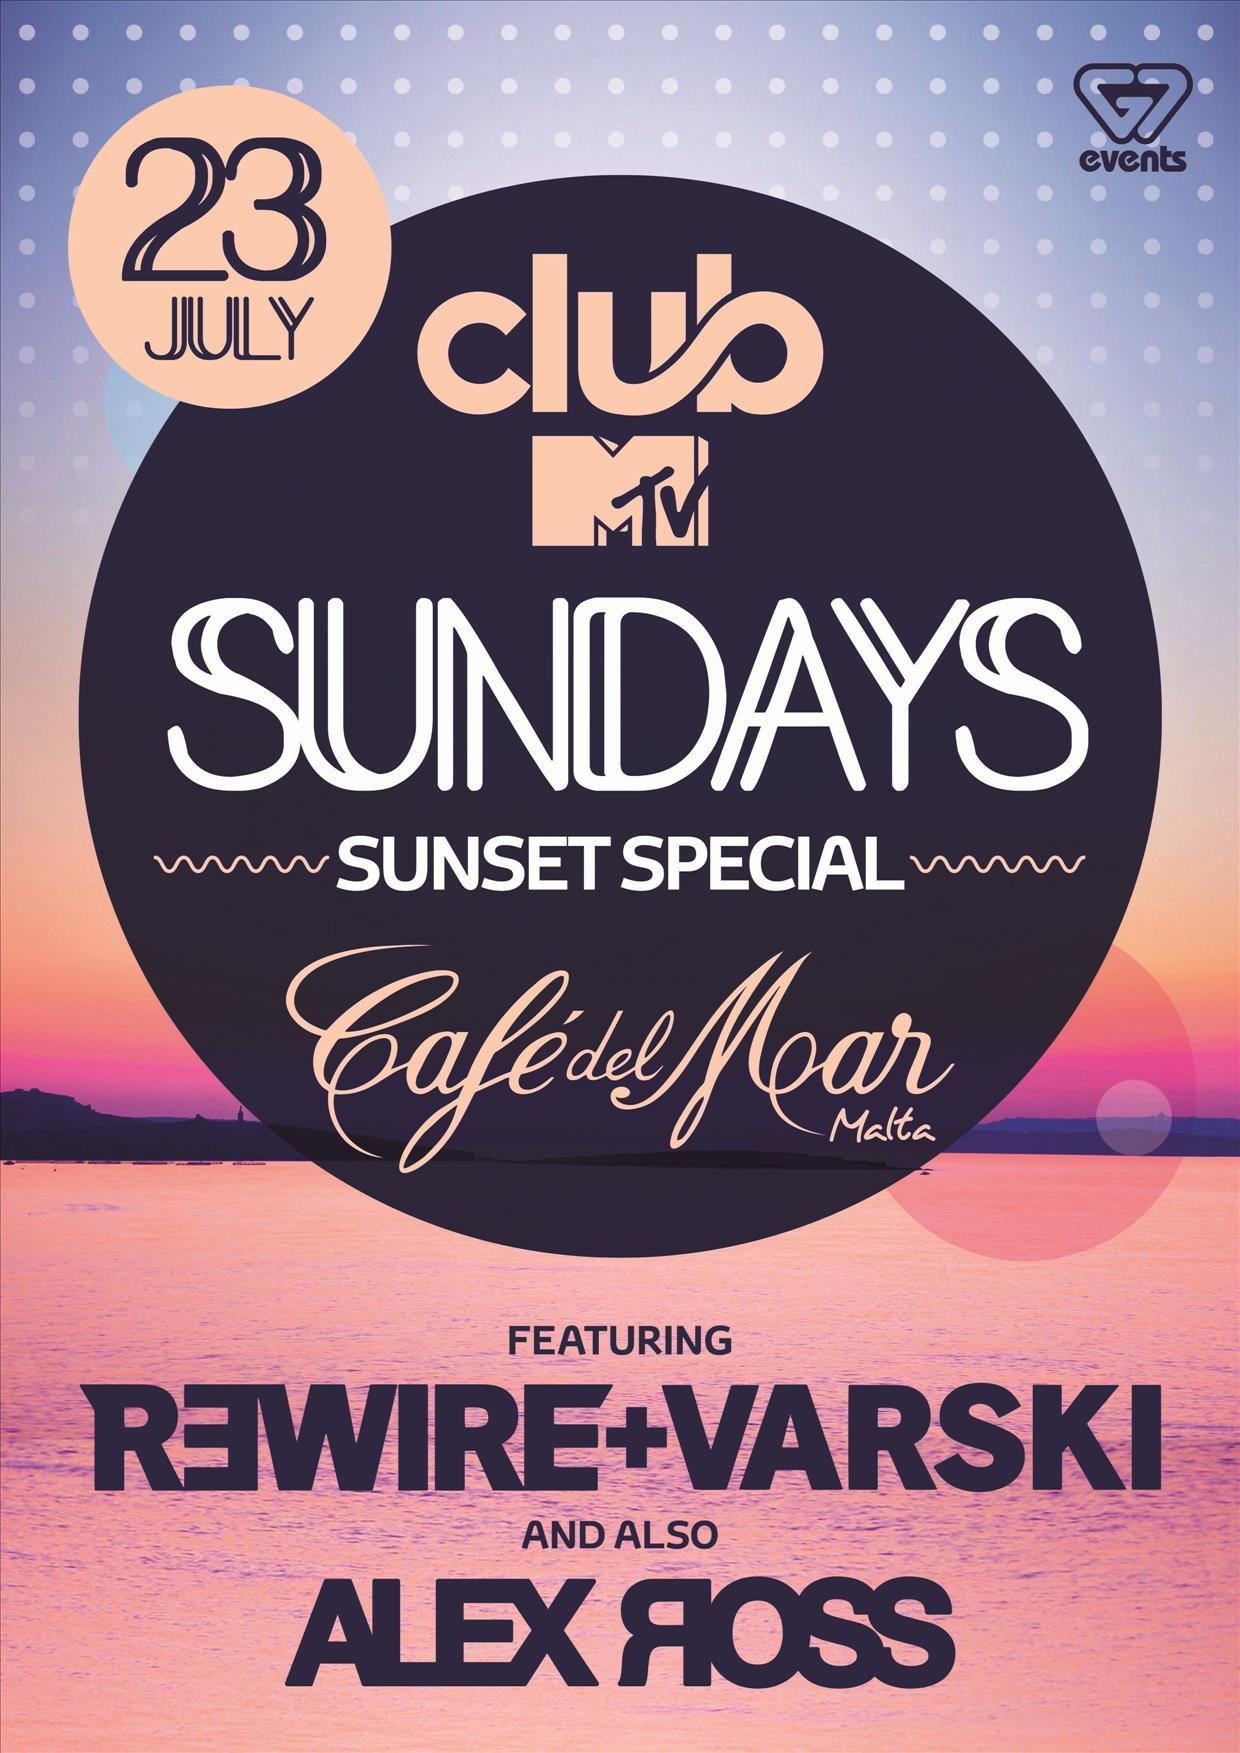 Club MTV Sundays present R3WIRE+VARSKI & ALEX ROSS flyer